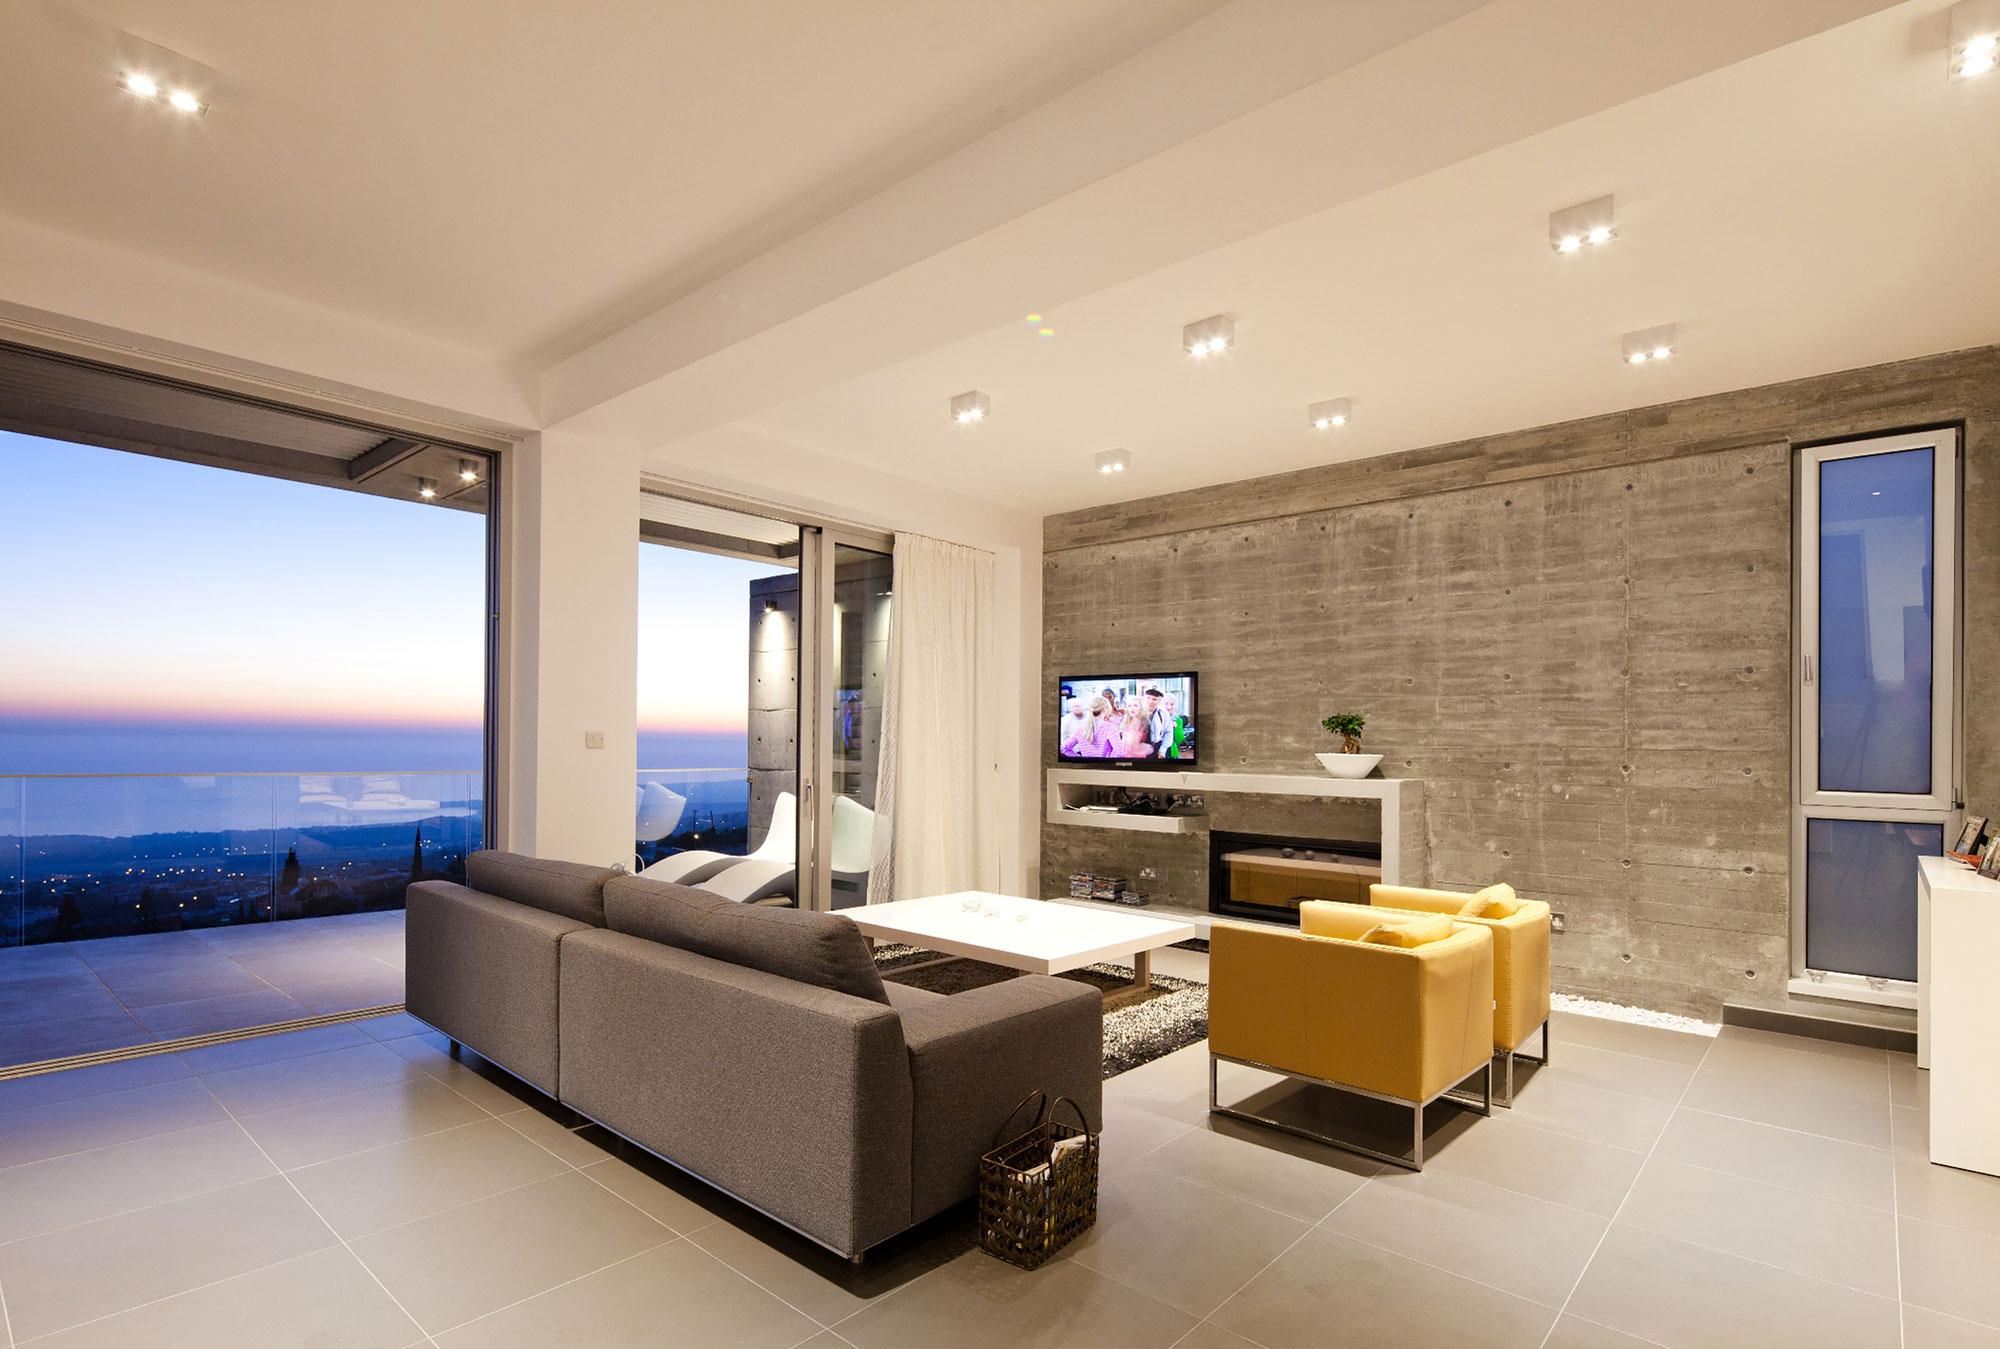 Modern Prodromos and Desi Residence in Paphos by Vardastudio Architects & Designers-12